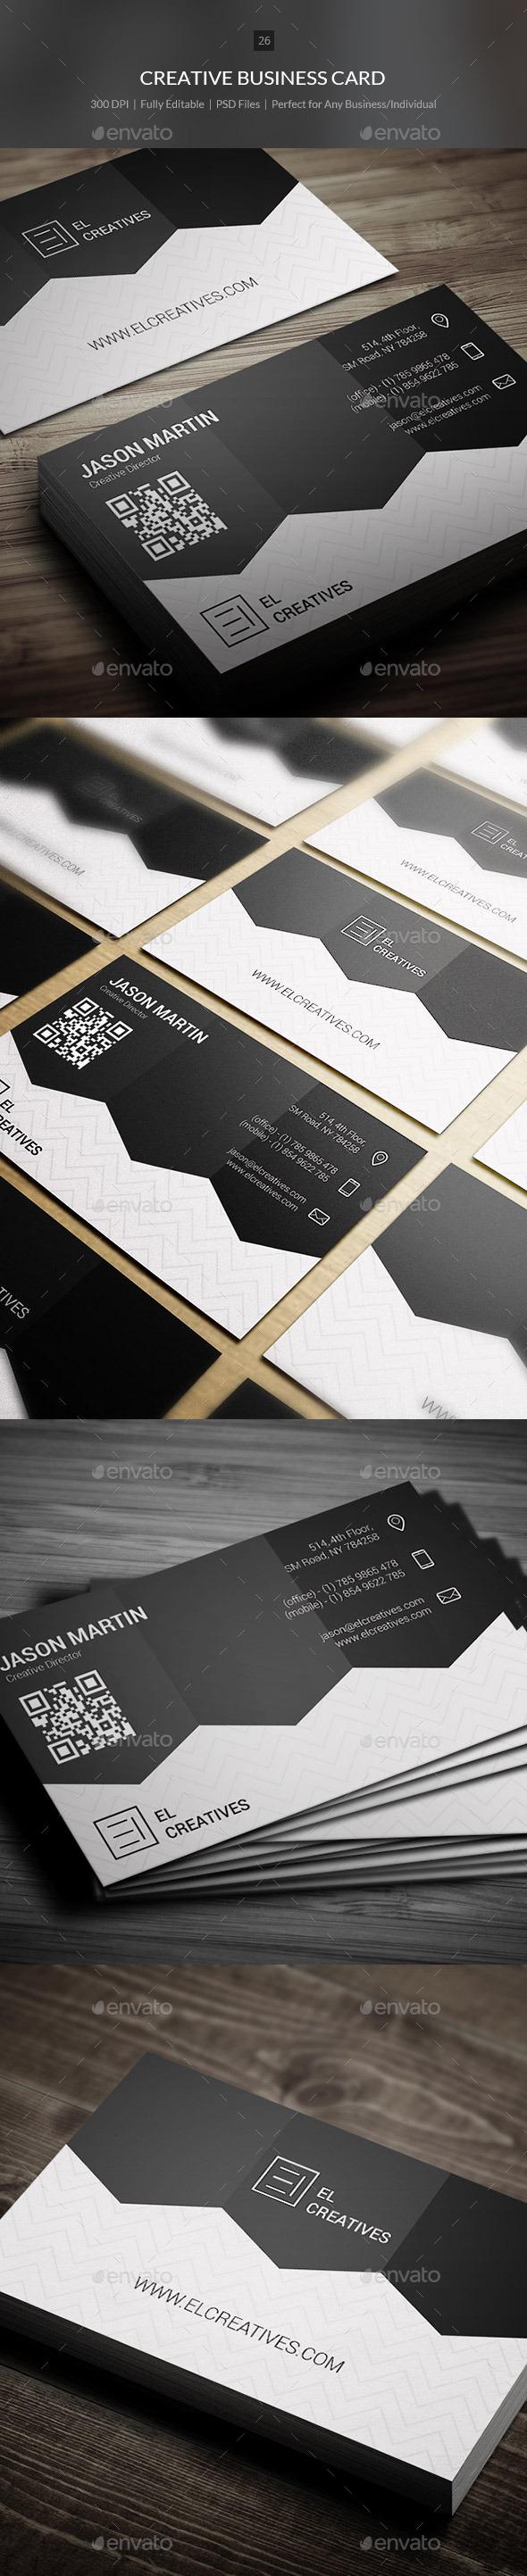 GraphicRiver Creative Business Card 26 10943218